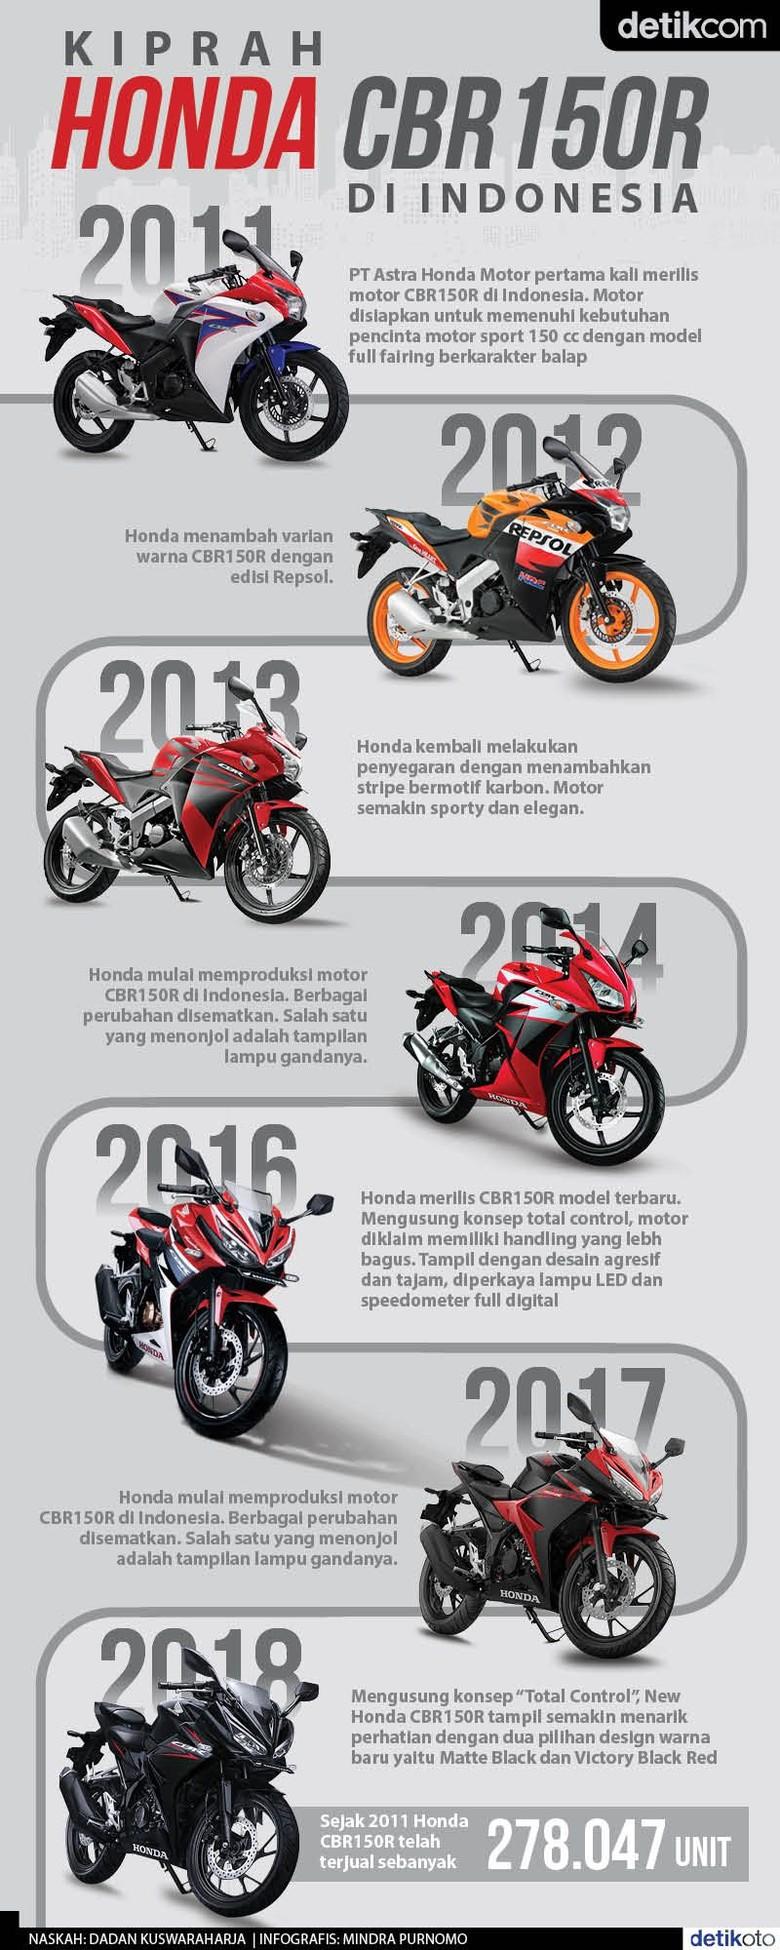 Kiprah Honda CBR150R di Indonesia